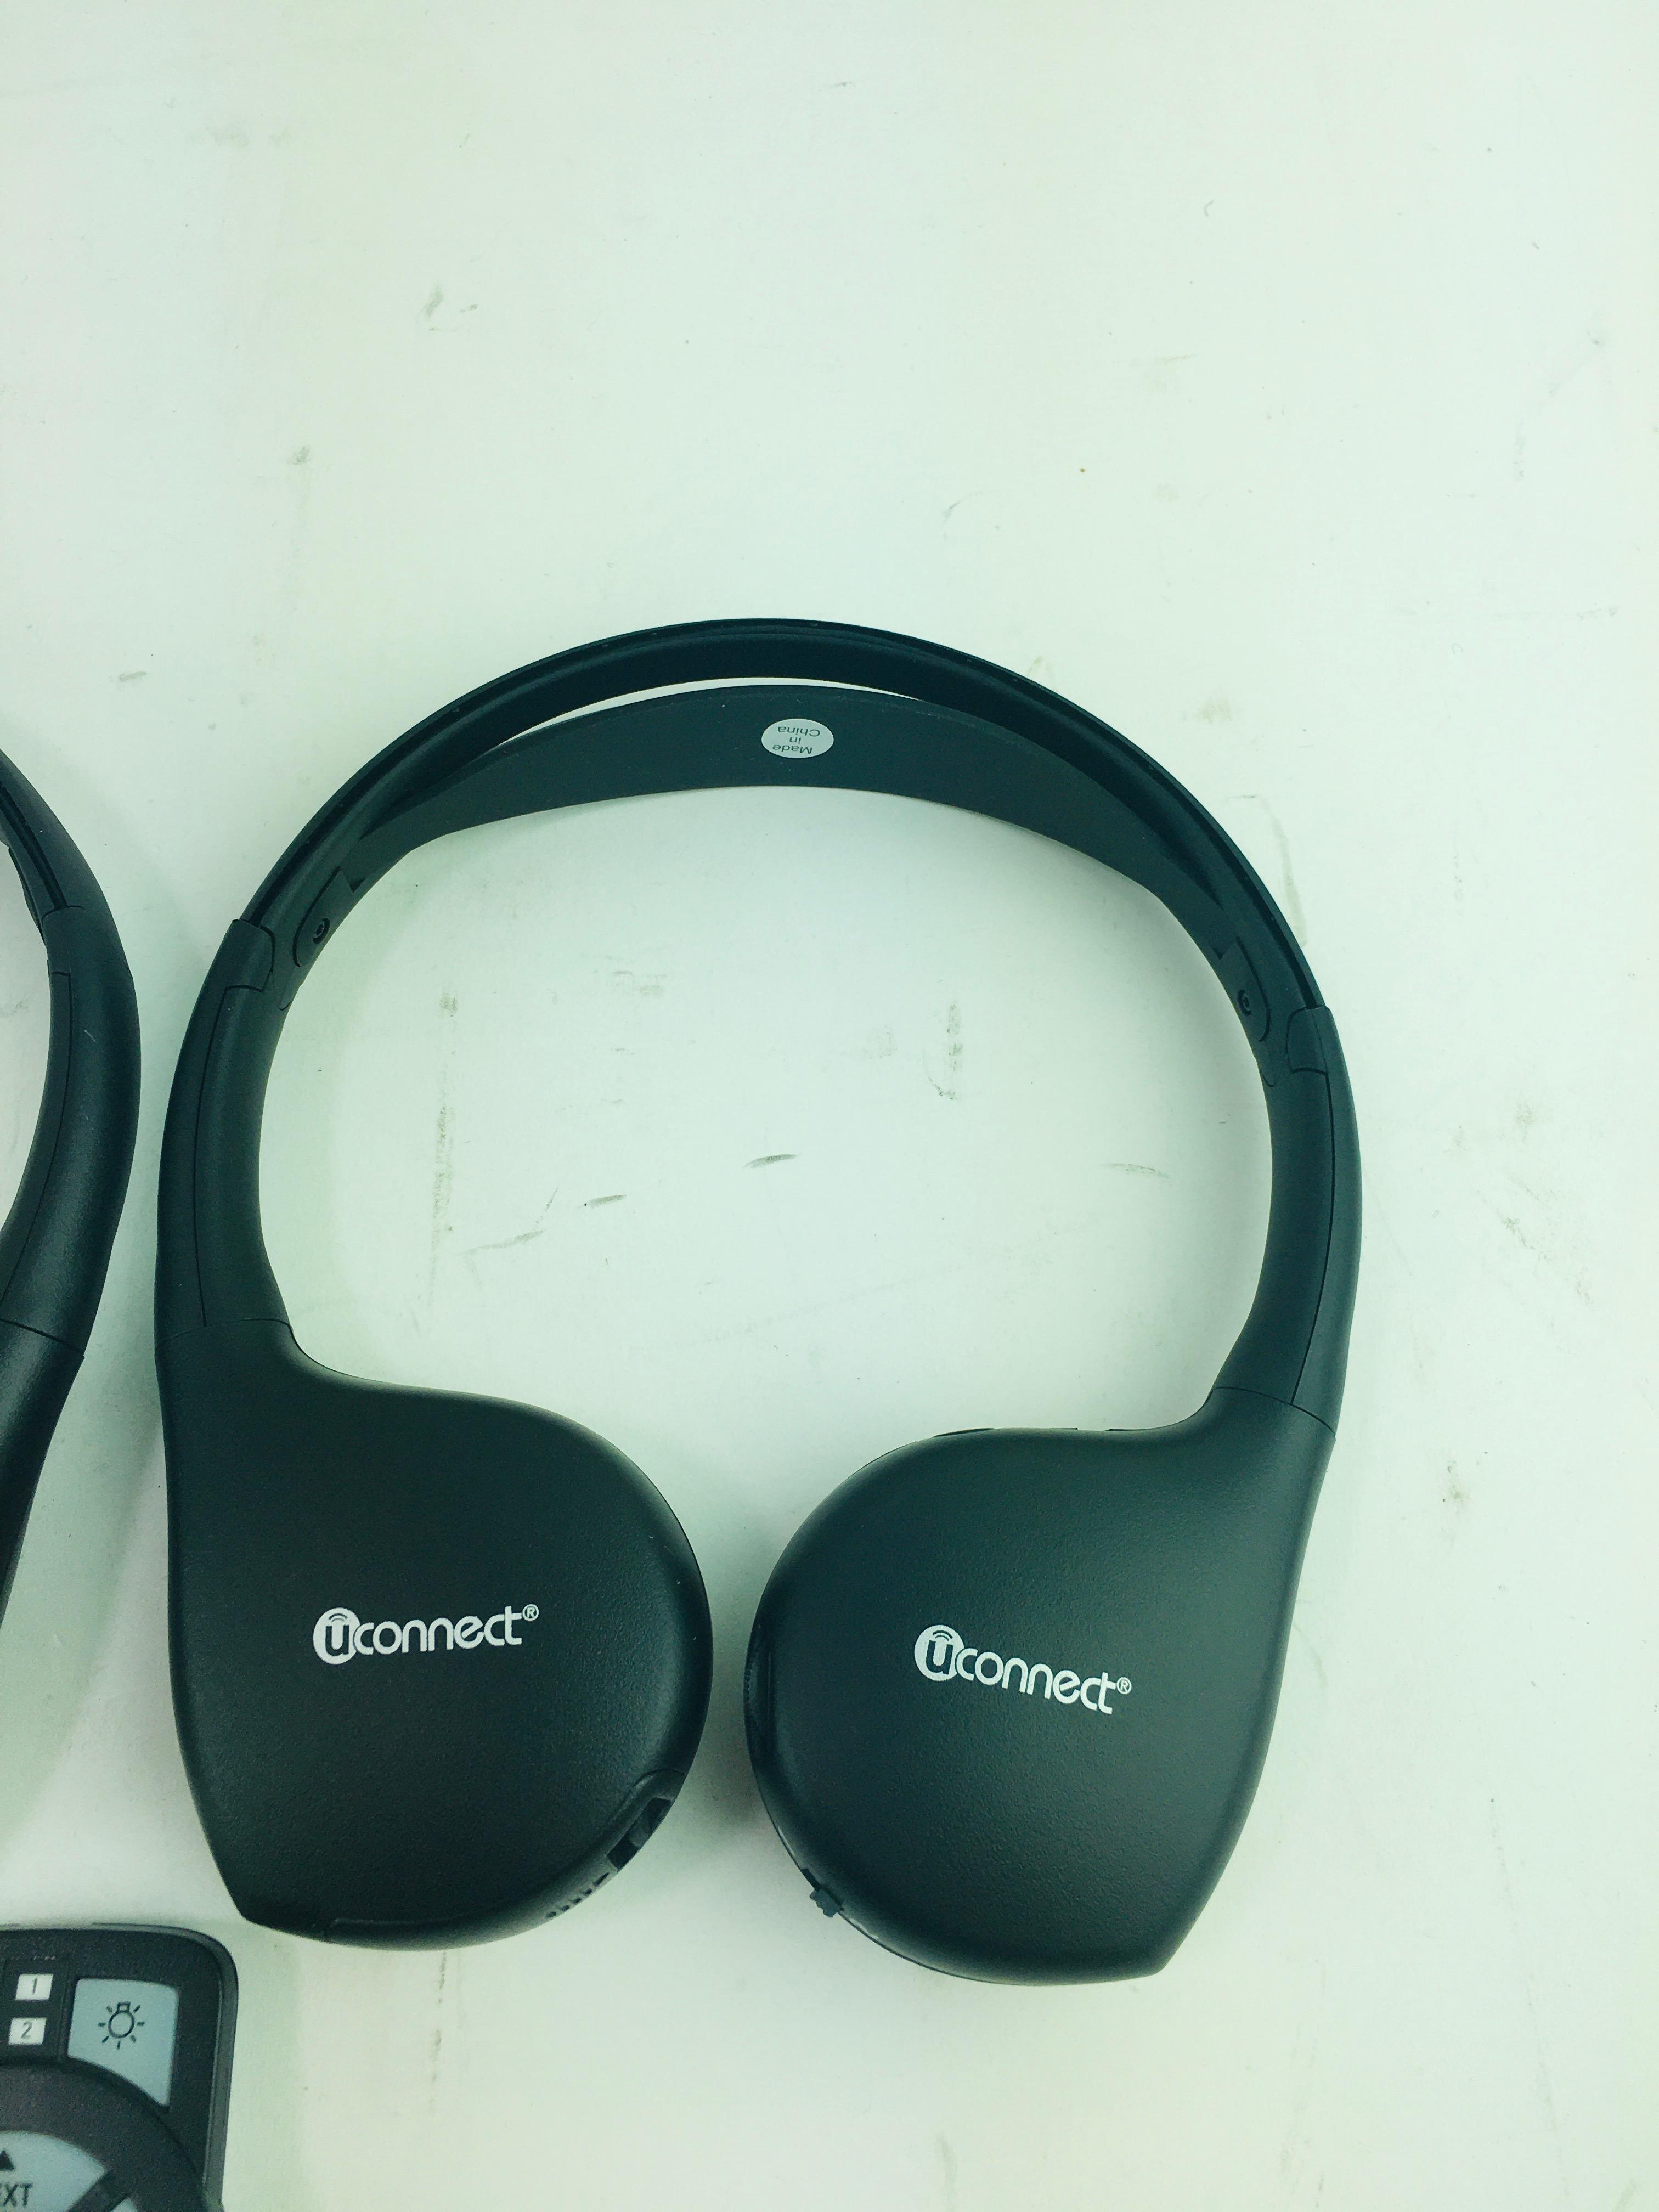 New Genuine OEM Mopar 82211695AD Chrysler Rear Audio U-Connect Headphones Remote - image 8